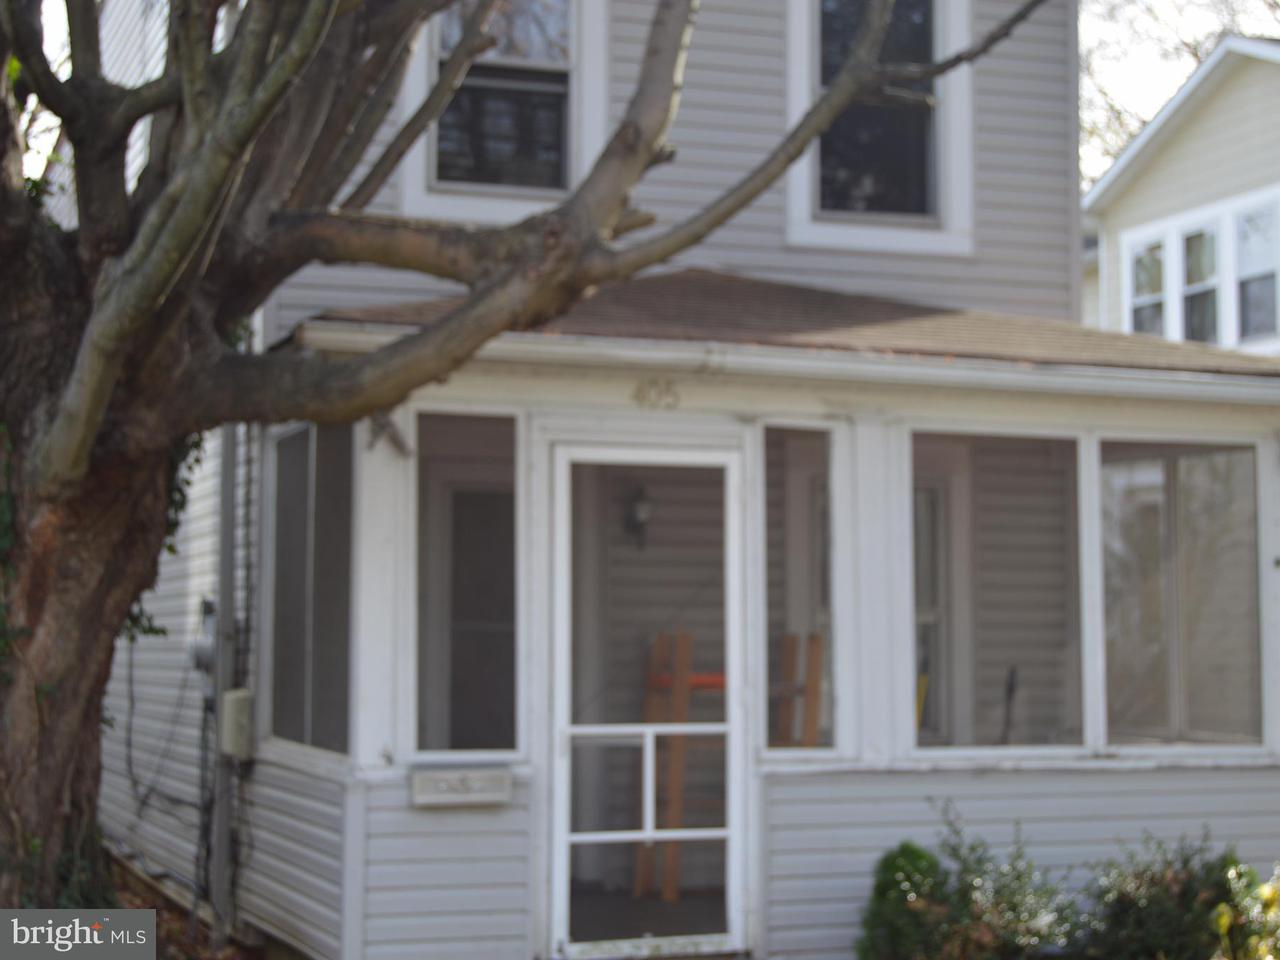 Single Family Home for Sale at 405 CHESAPEAKE Avenue 405 CHESAPEAKE Avenue Annapolis, Maryland 21403 United States